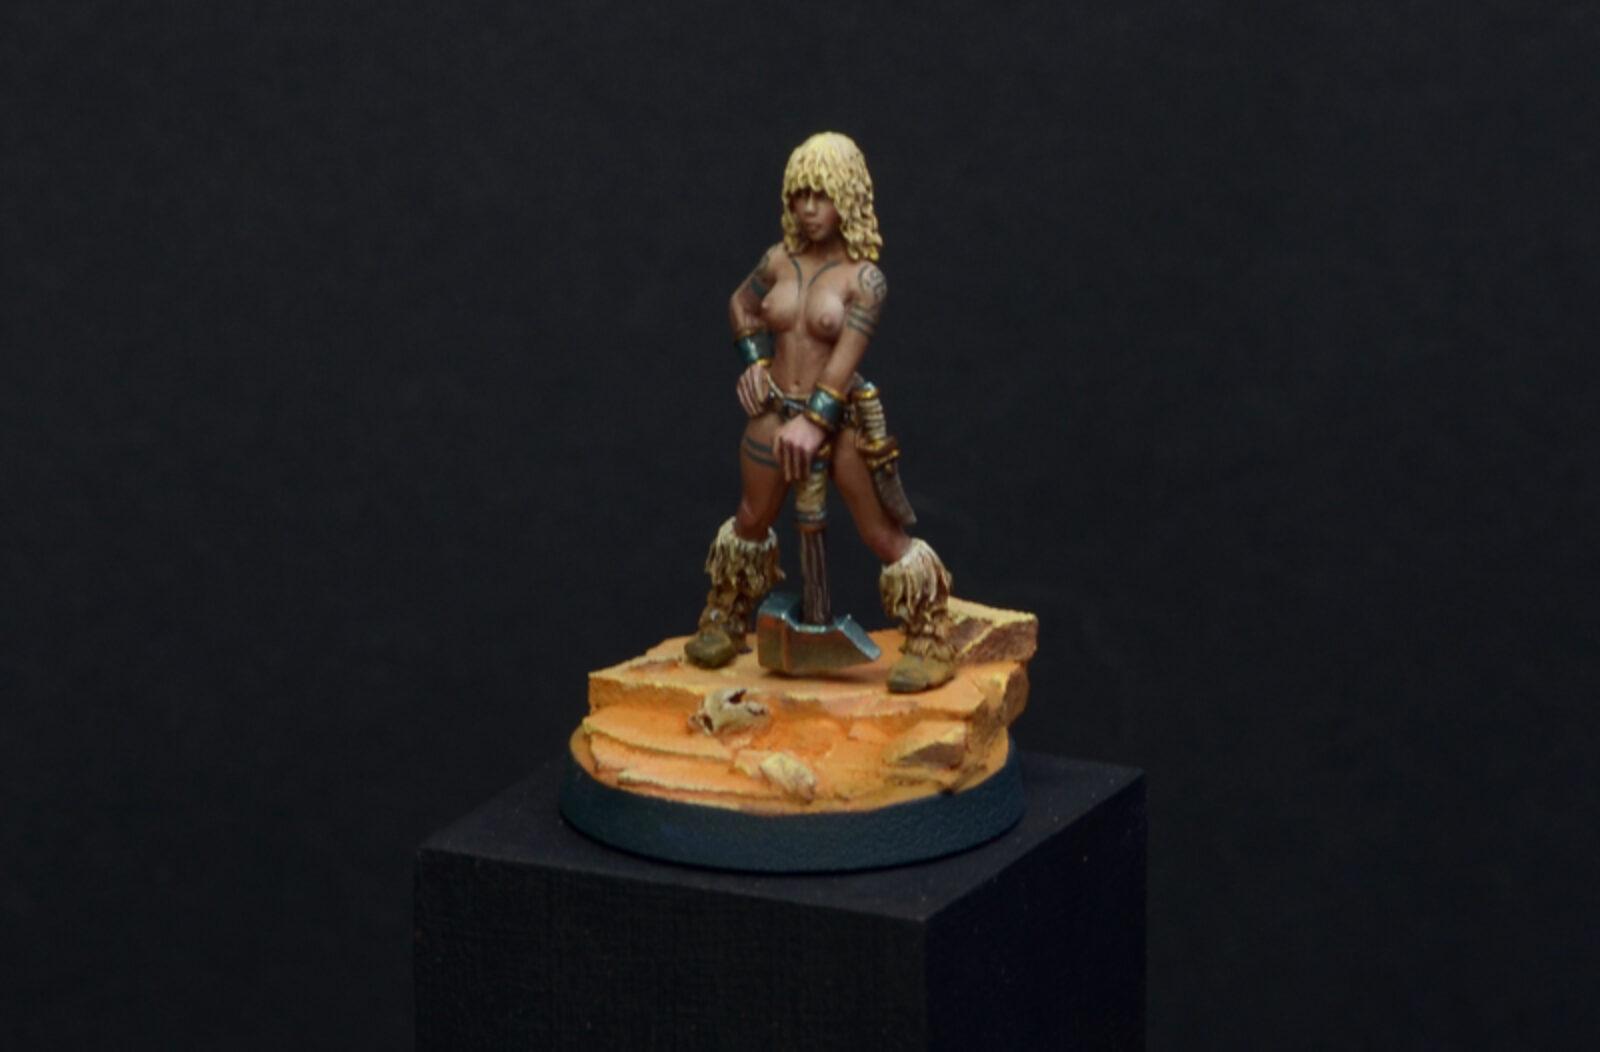 Hf Barb Zeta07